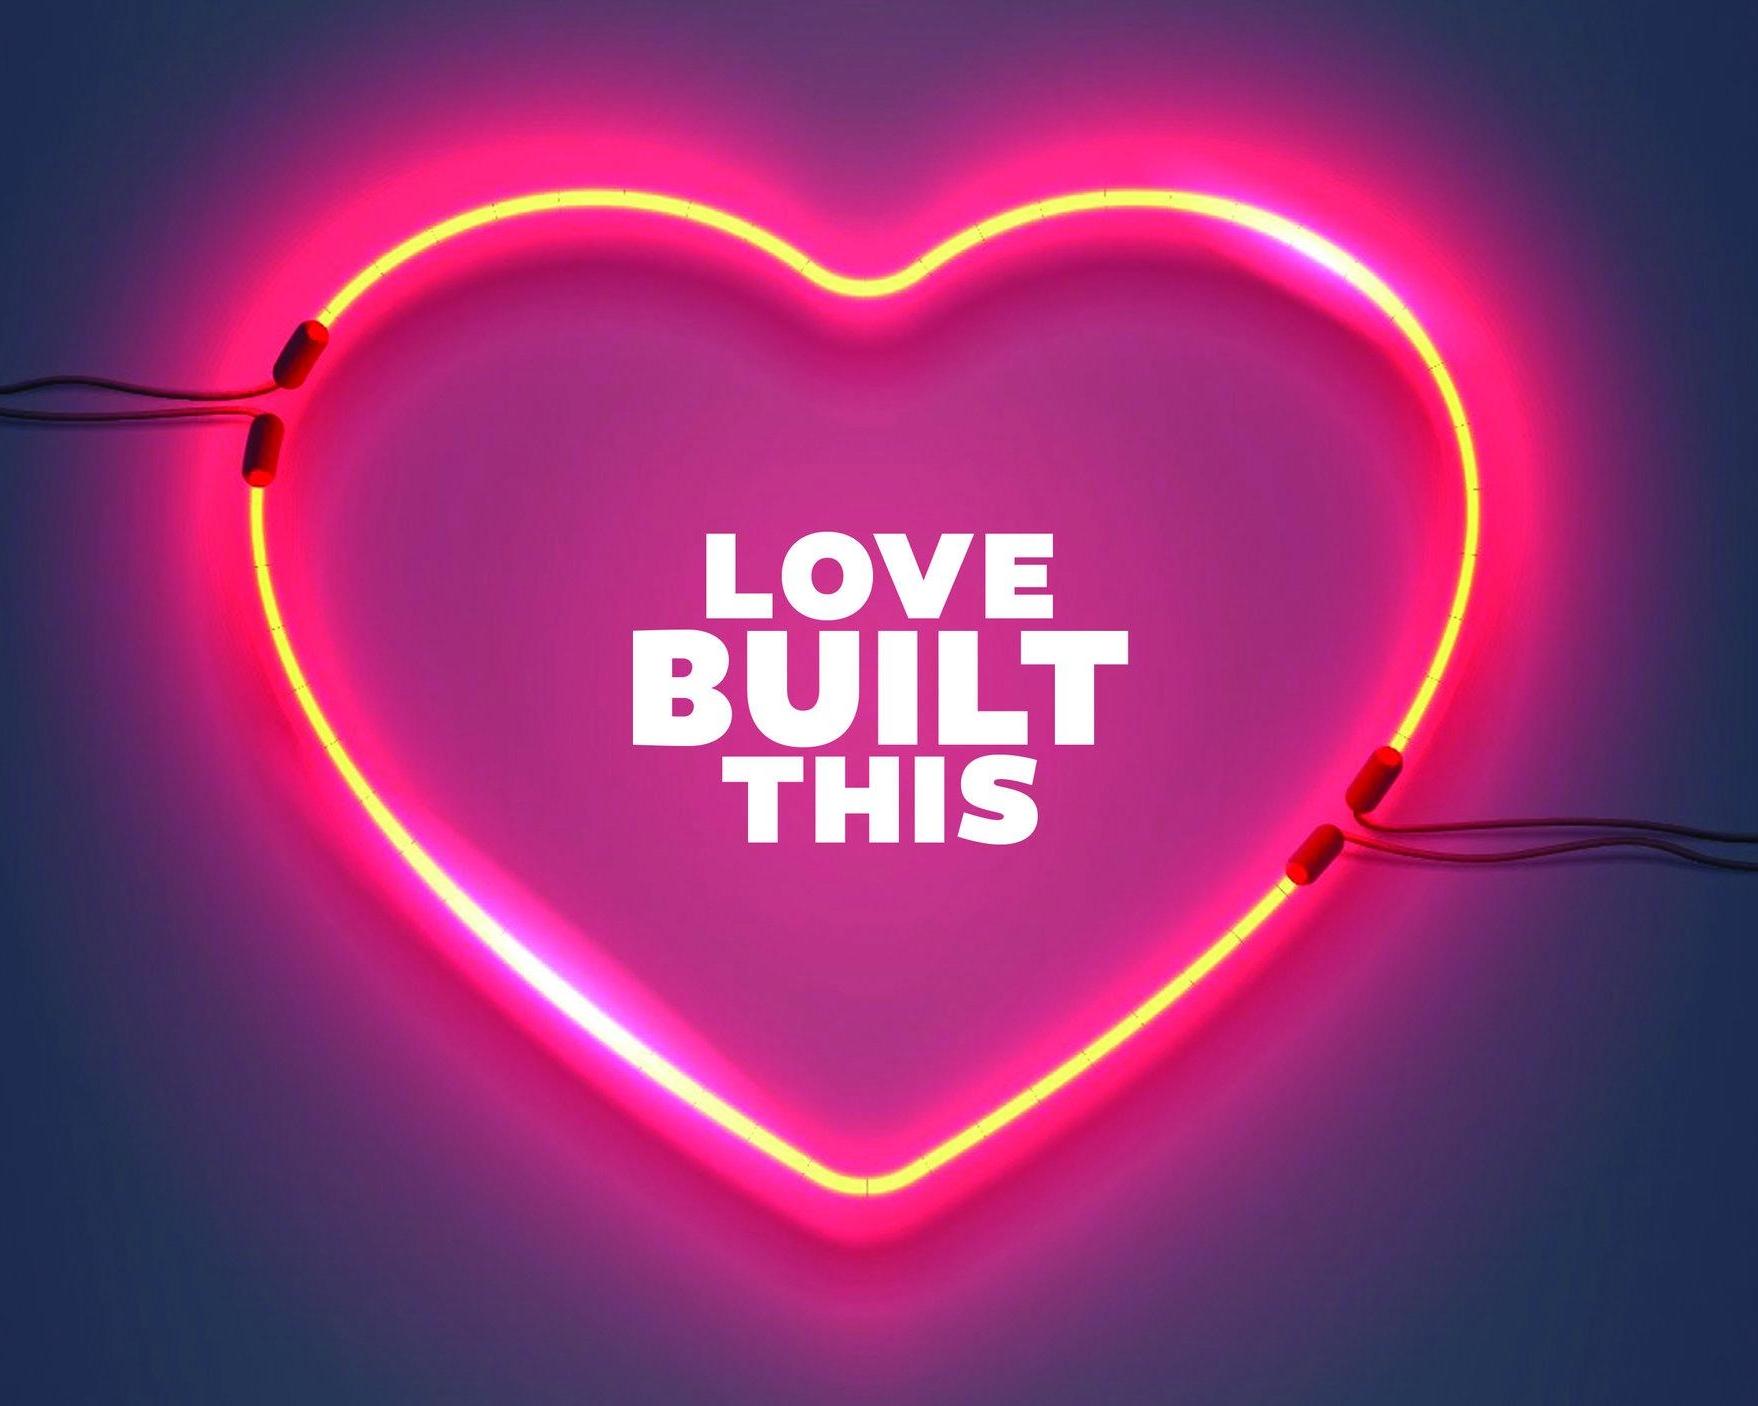 LoveBuiltThis-Image.jpg